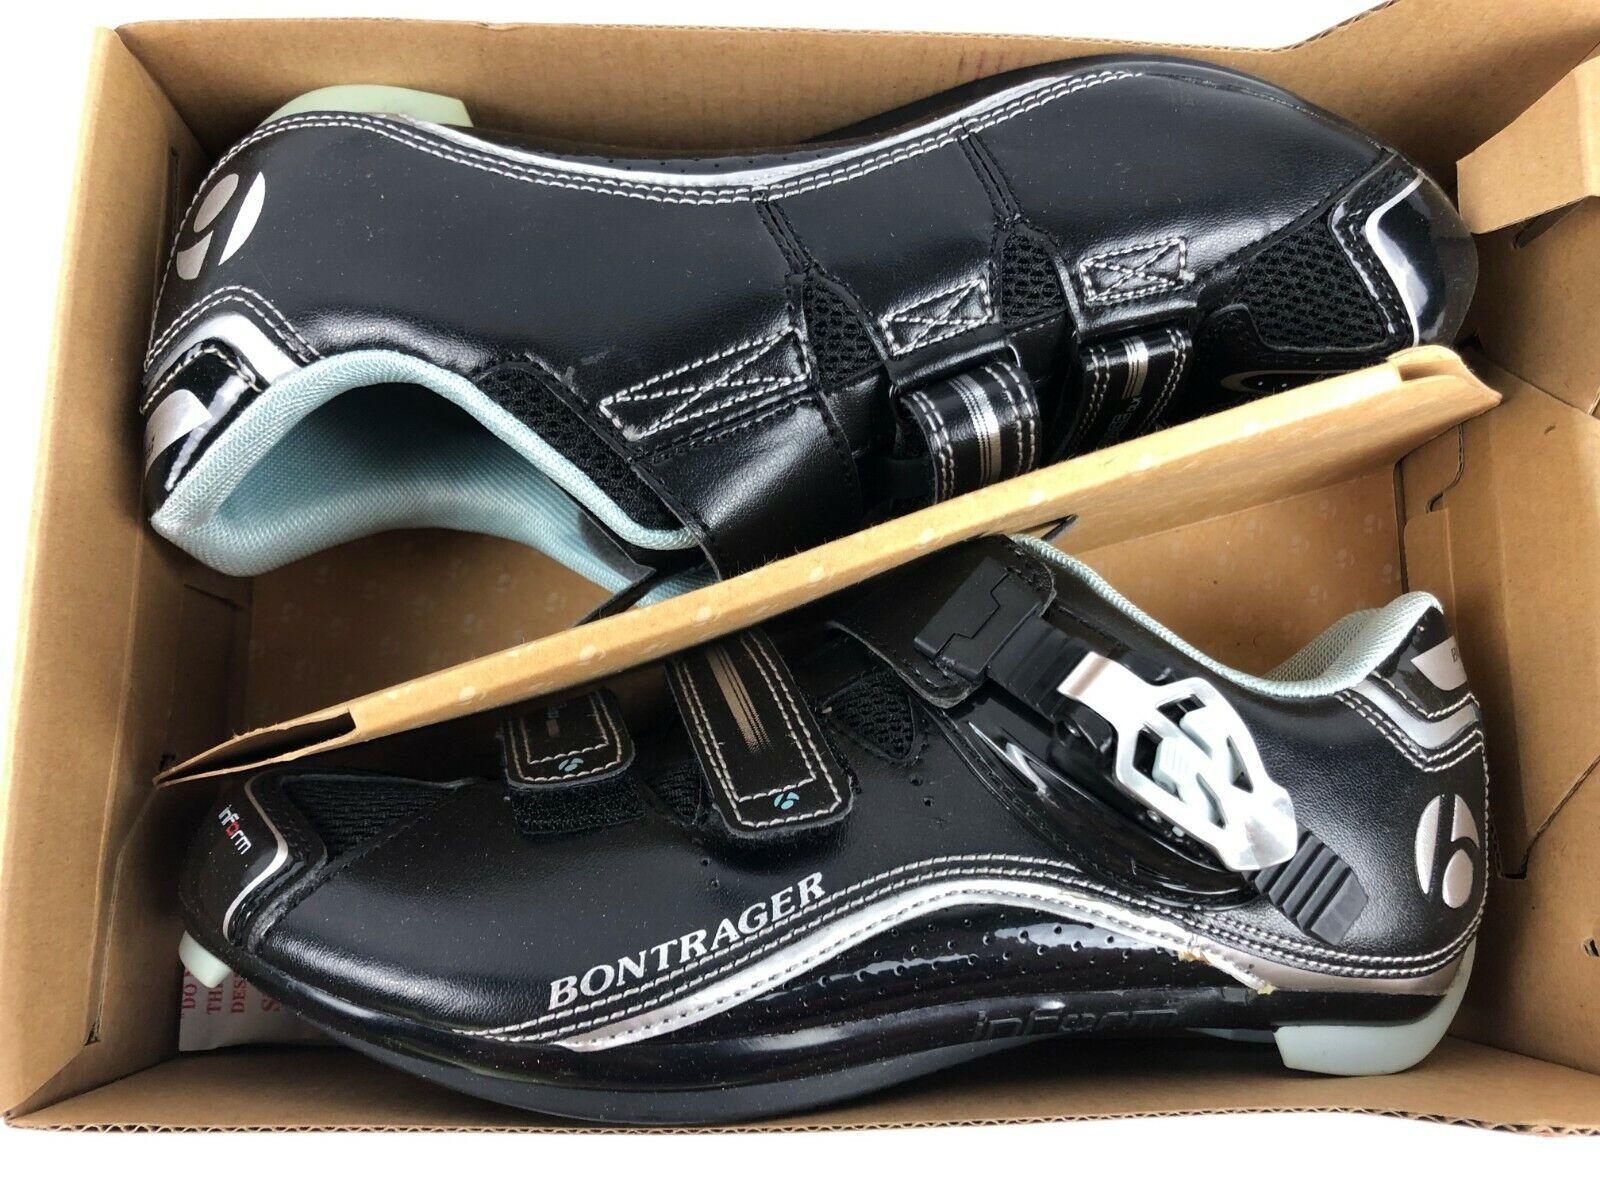 Bontrager Race DLX Wouomo Road scarpe US 7.5 3y